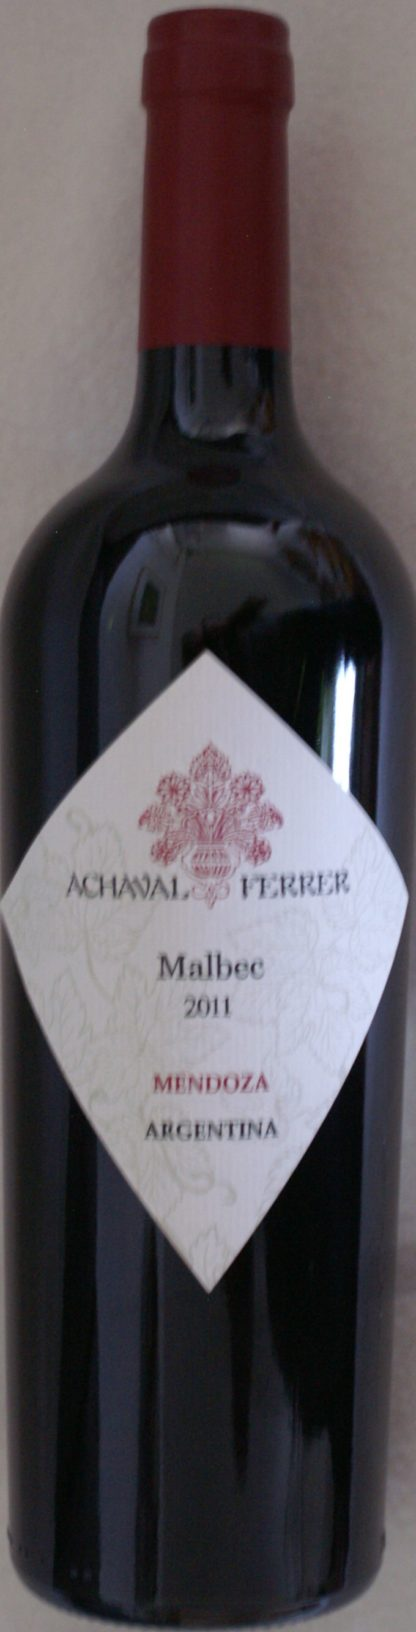 Achaval Ferrer Malbec 2011